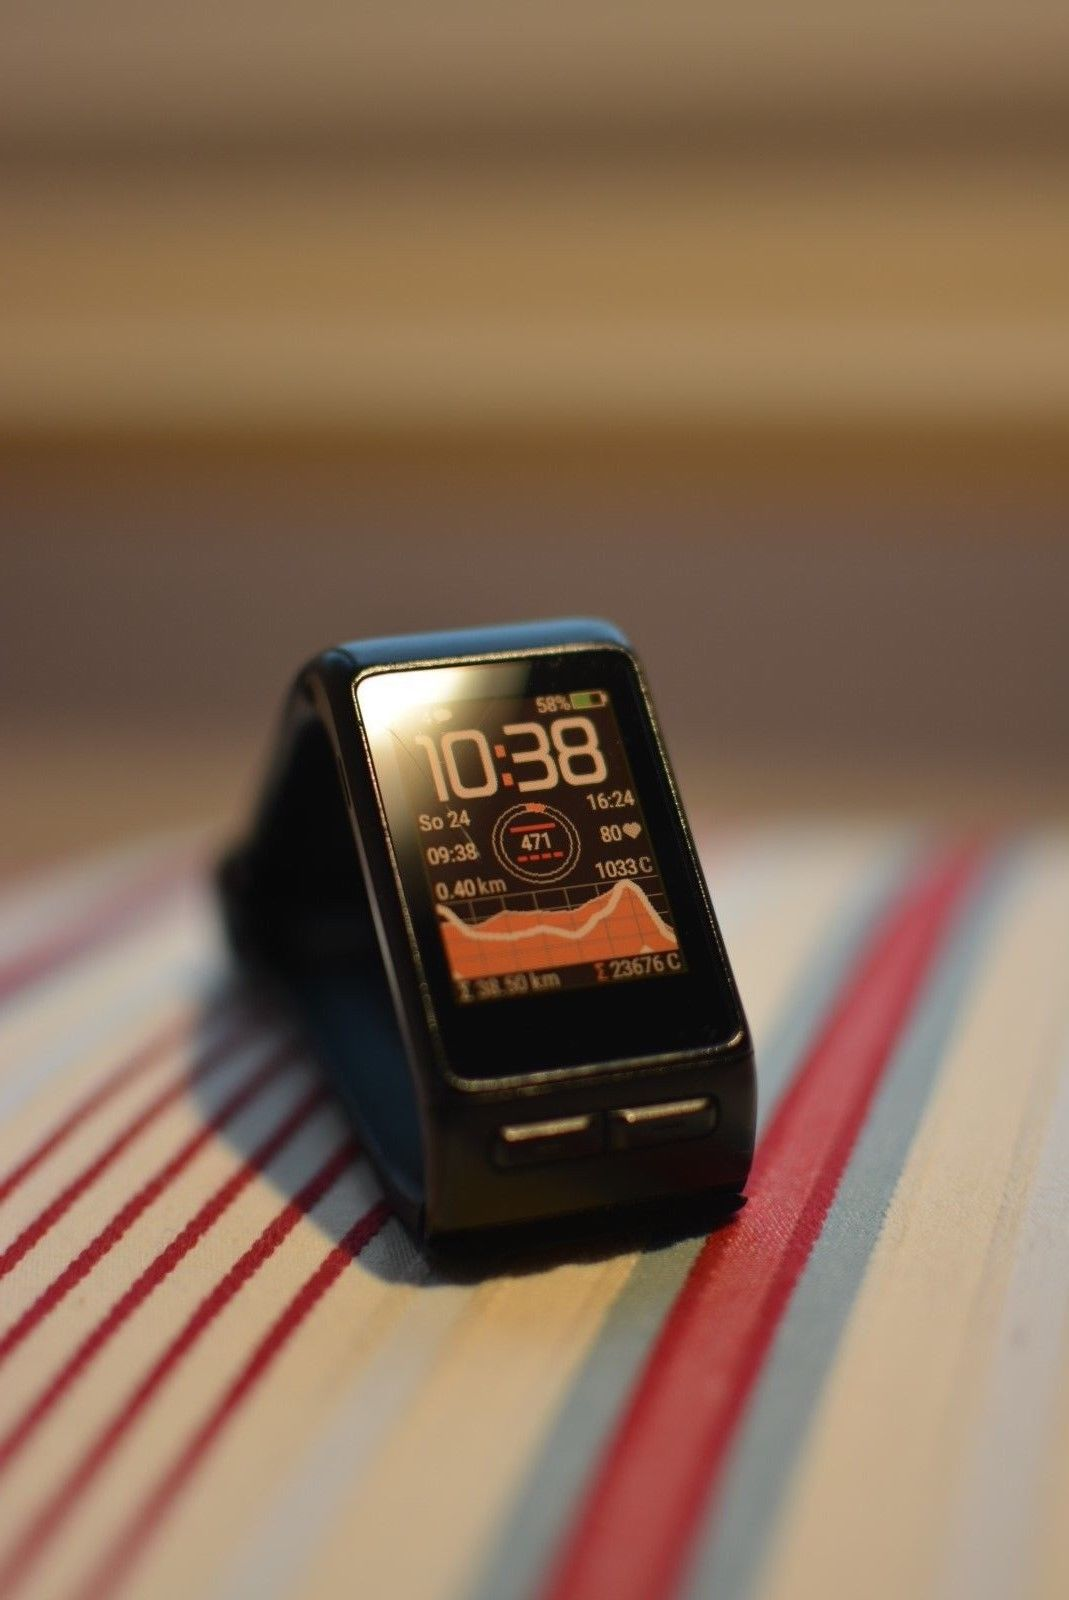 *TOP* Garmin vívoactive HR GPS-Smartwatch (integr. Herzfrequenzmessung) via DHL